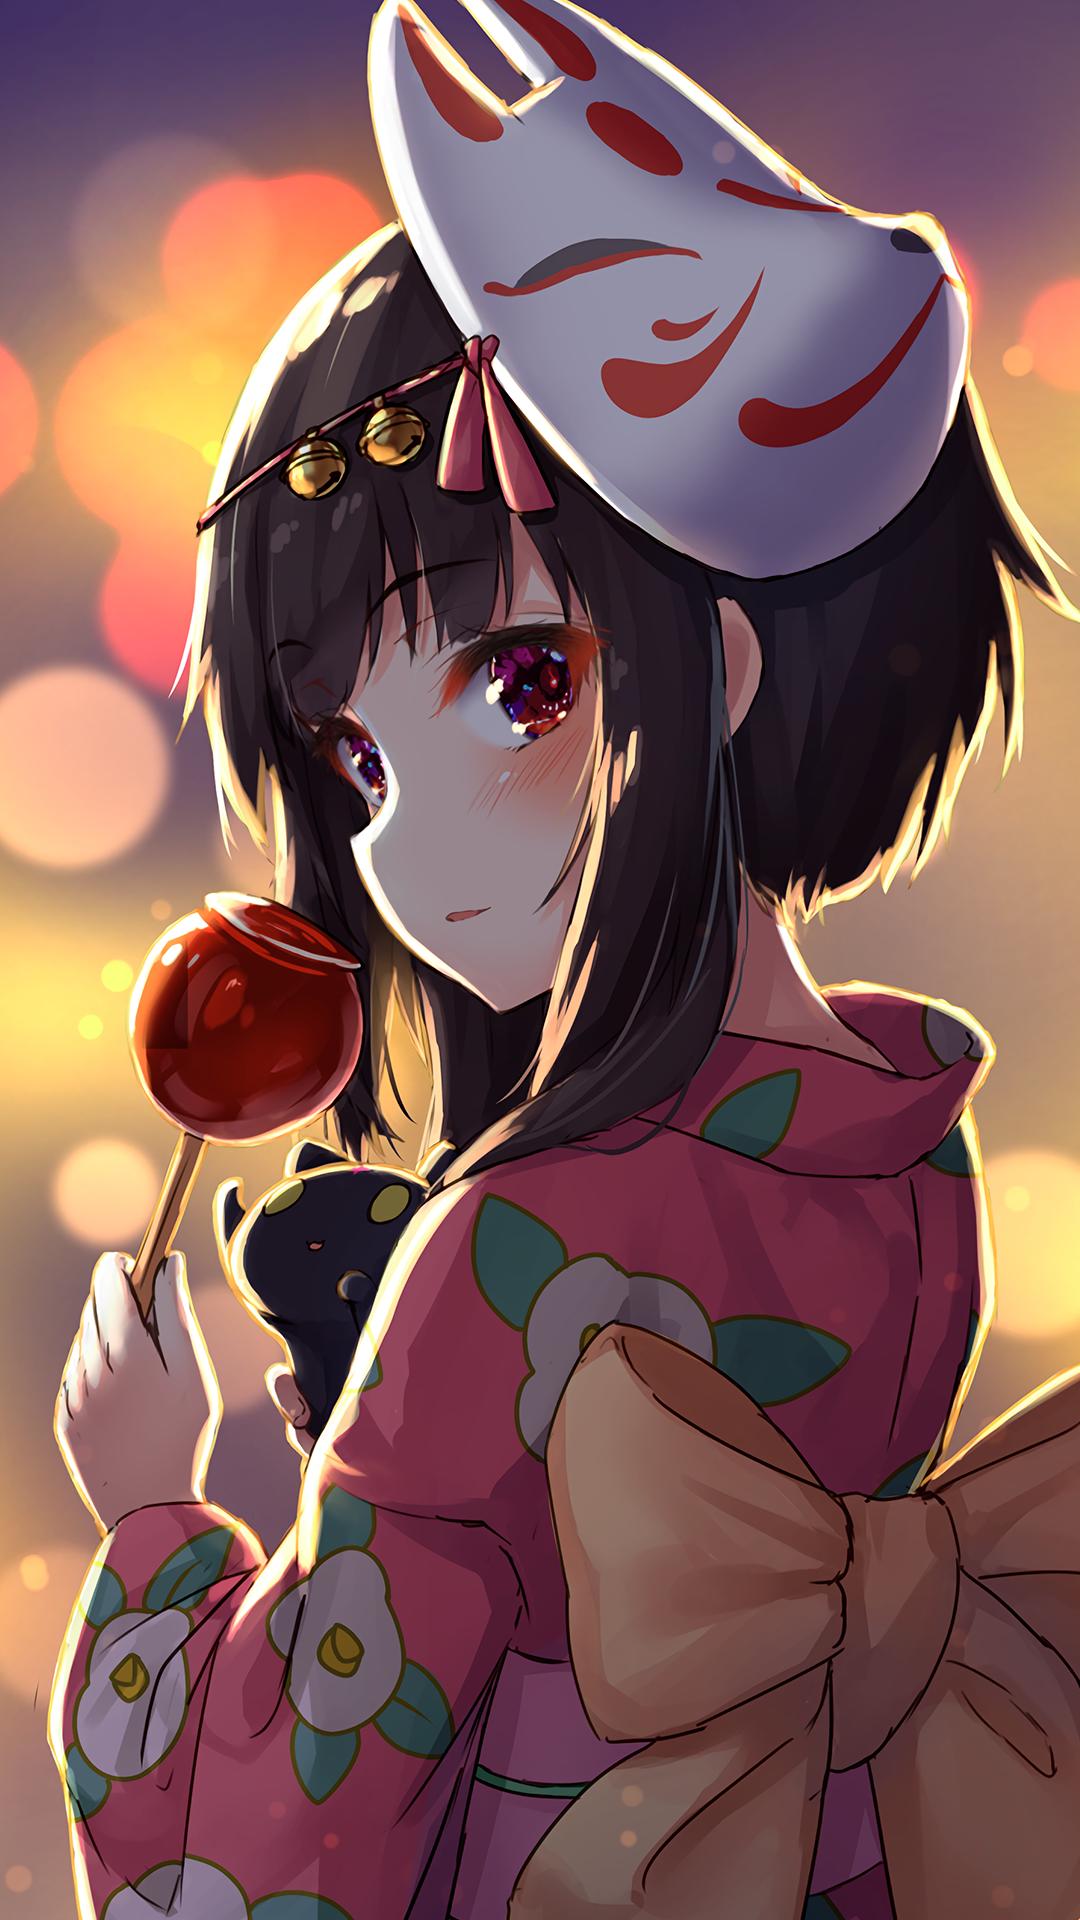 Starry Night Megumin Konosuba 1080x2160 Anime Wallpaper Cute Anime Character Thicc Anime